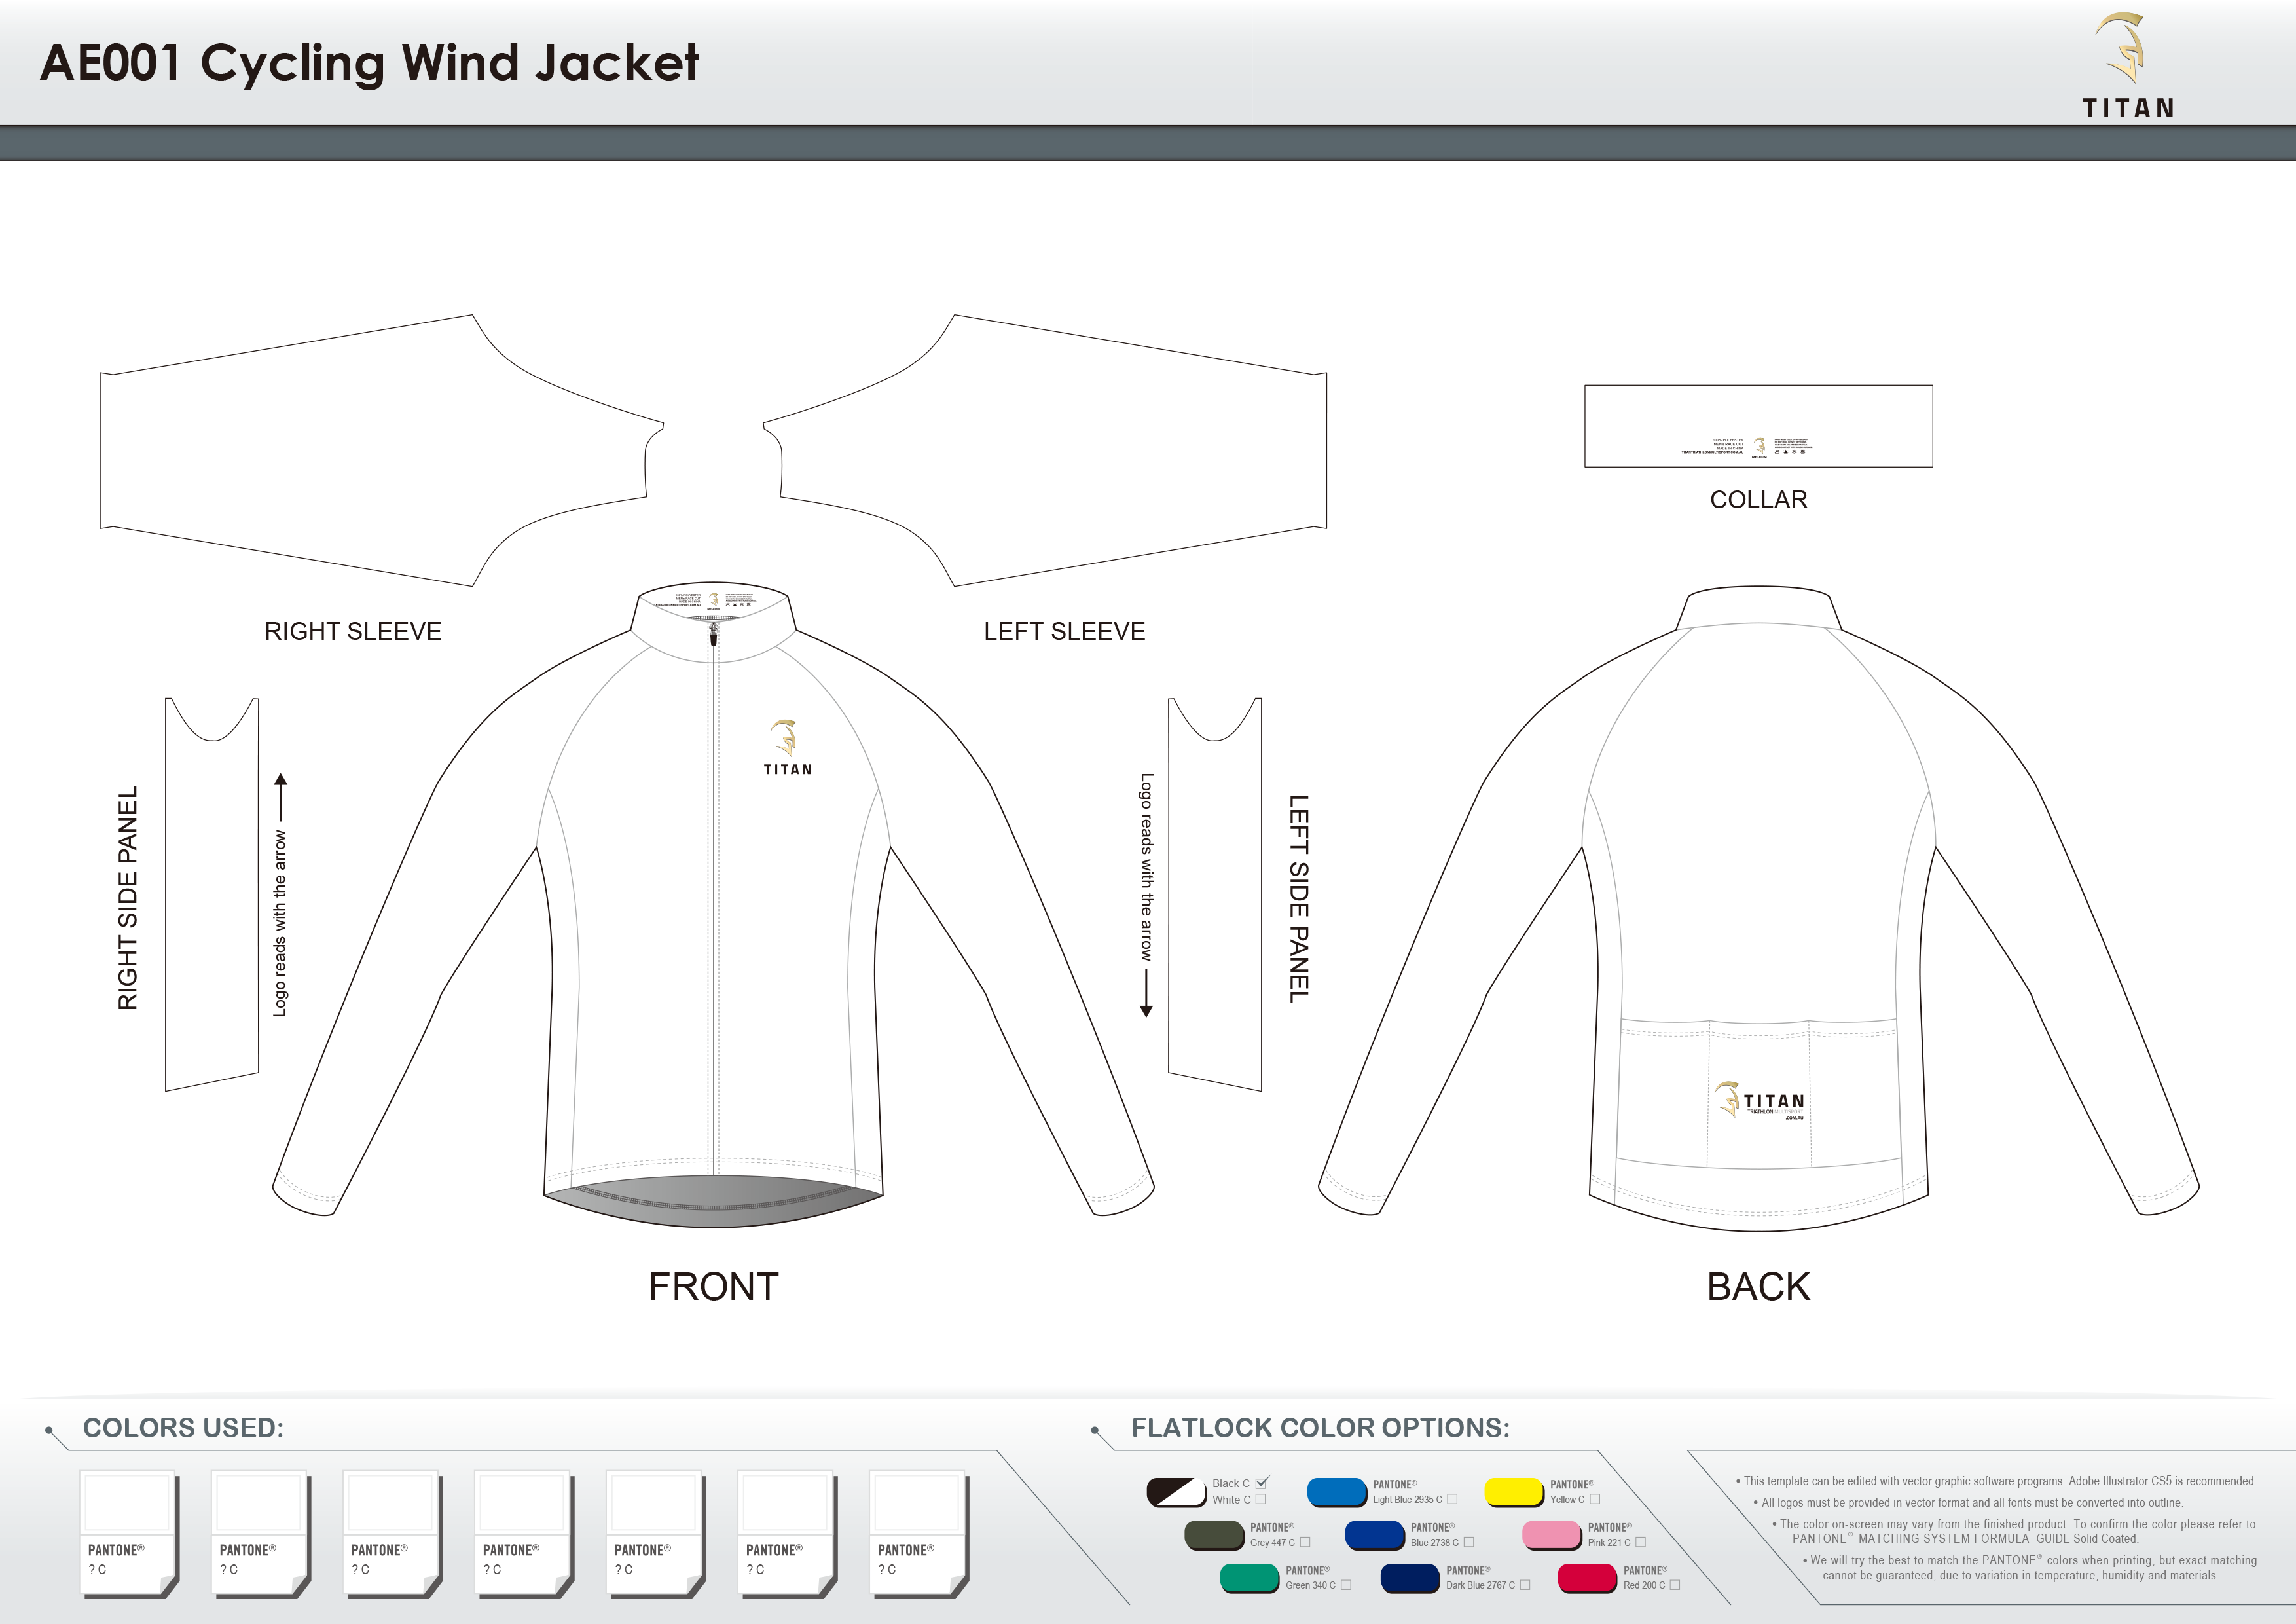 AE001 Cycling Wind Jacket